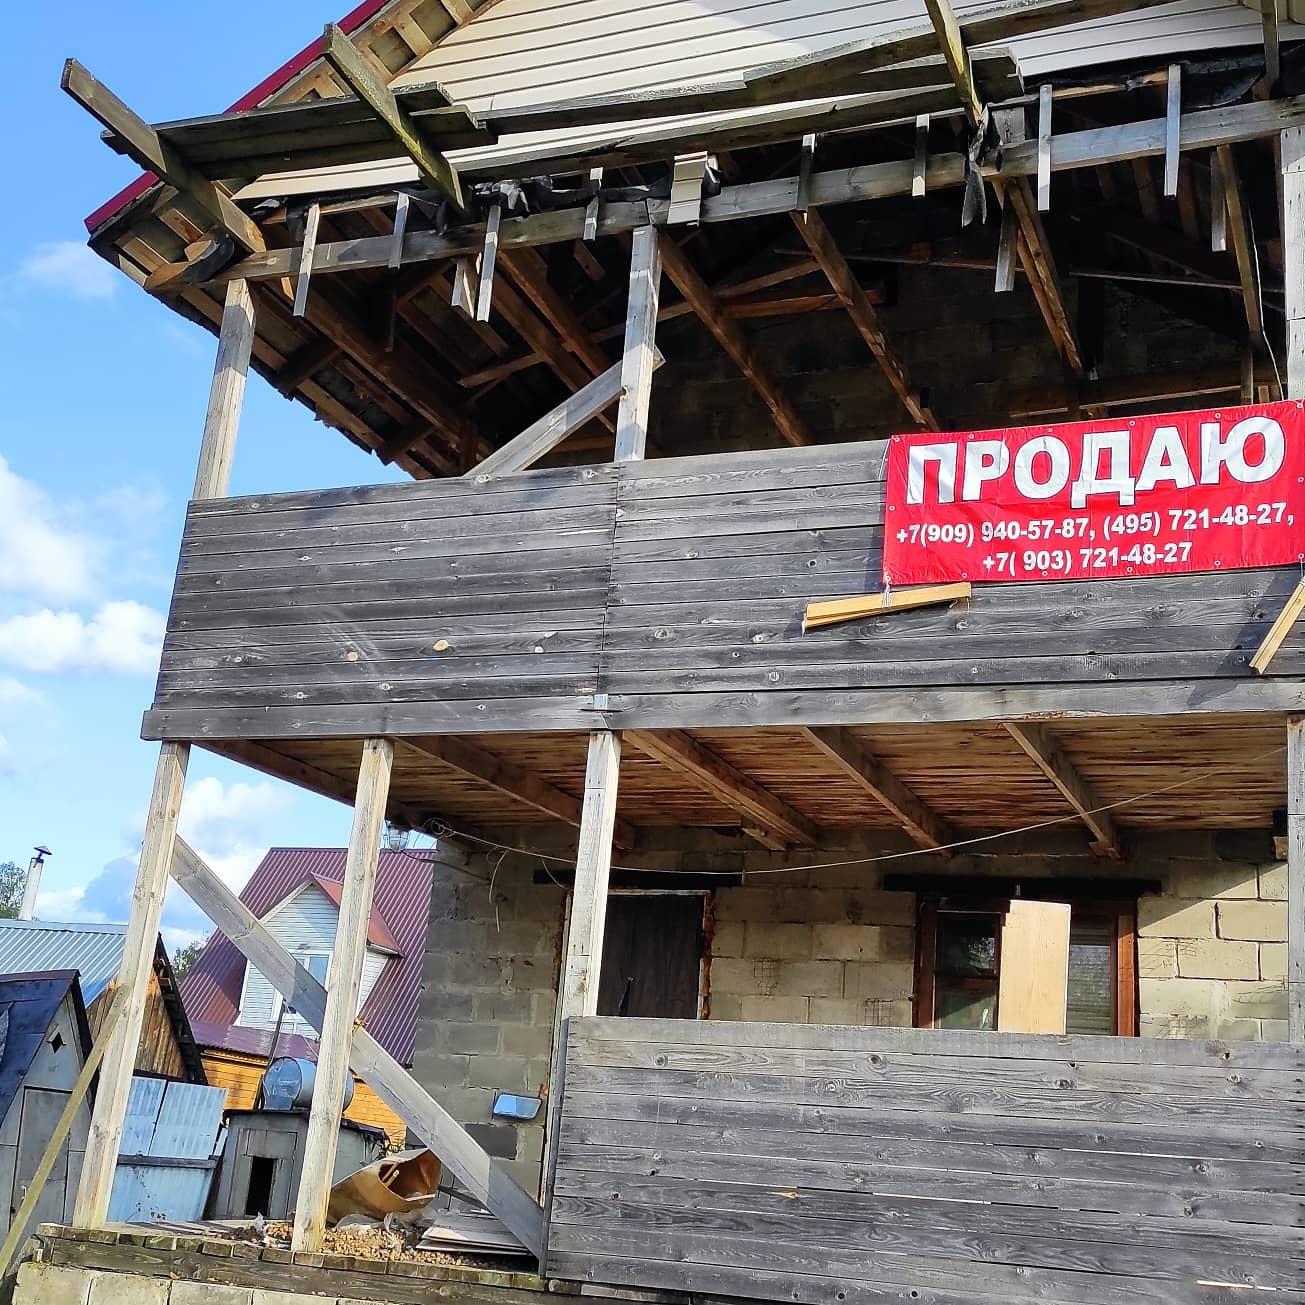 Продаётся  дом/дача 81.0 кв.м.  за 2 700 000 руб